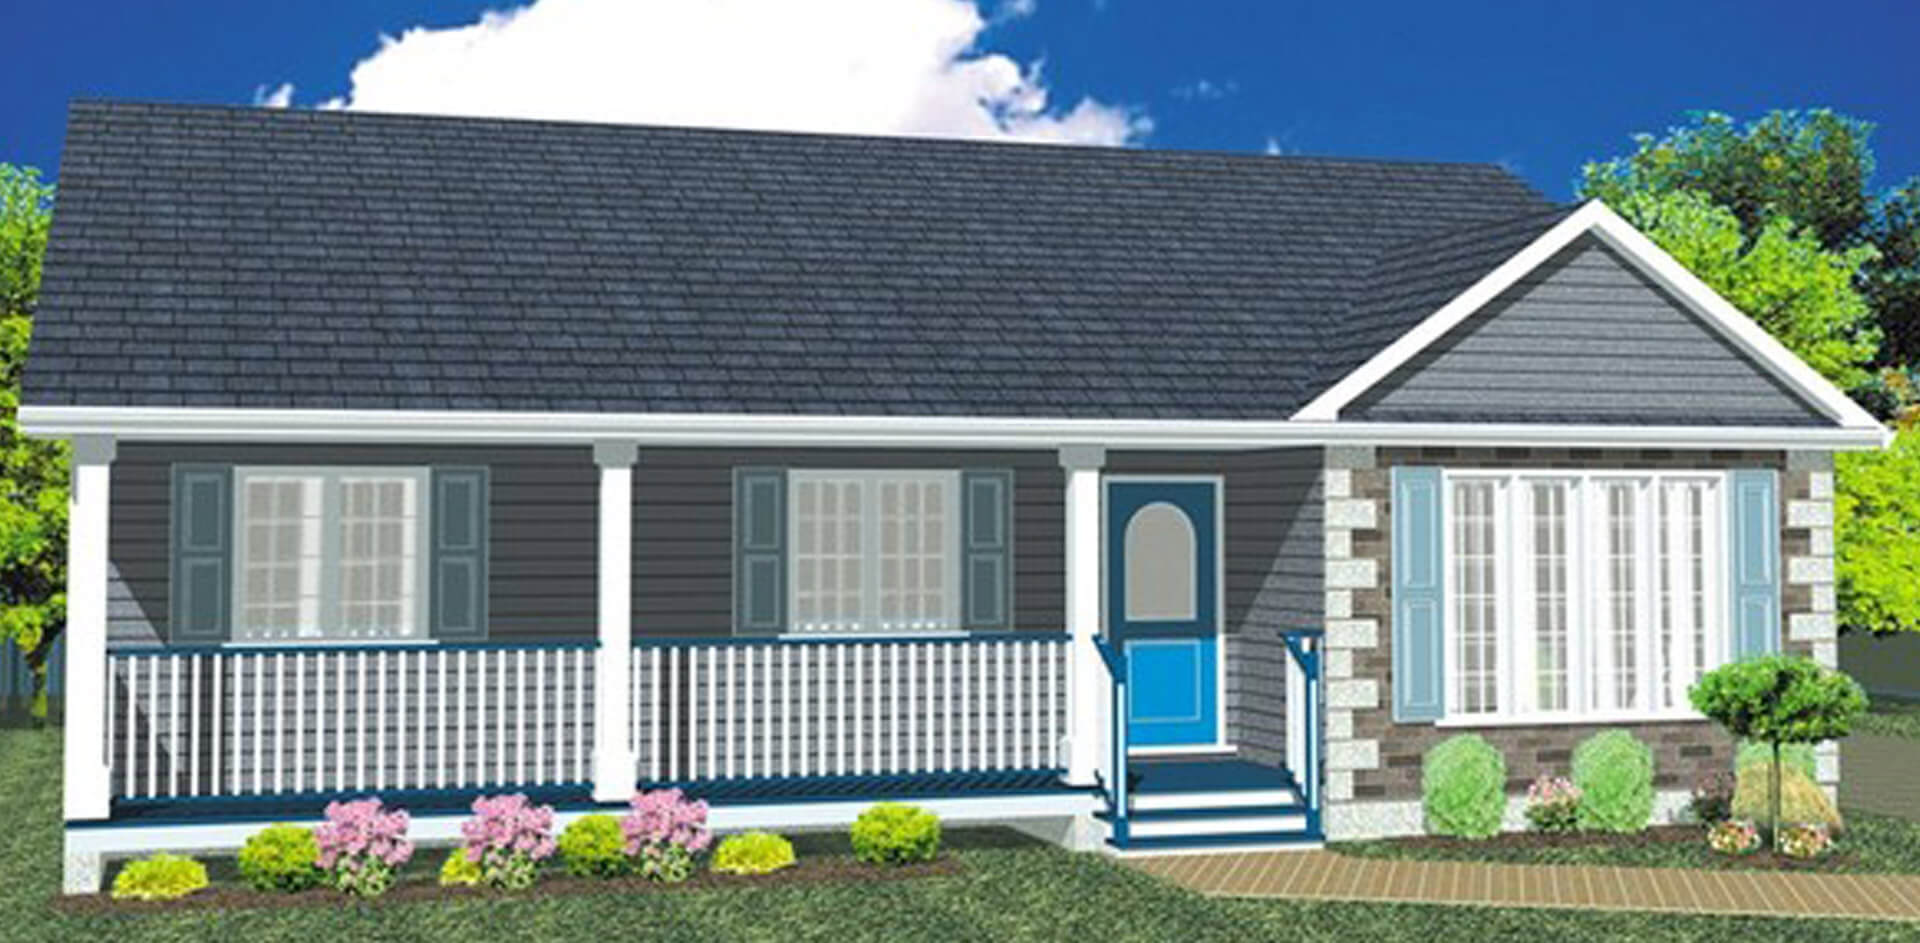 5005 house exterior